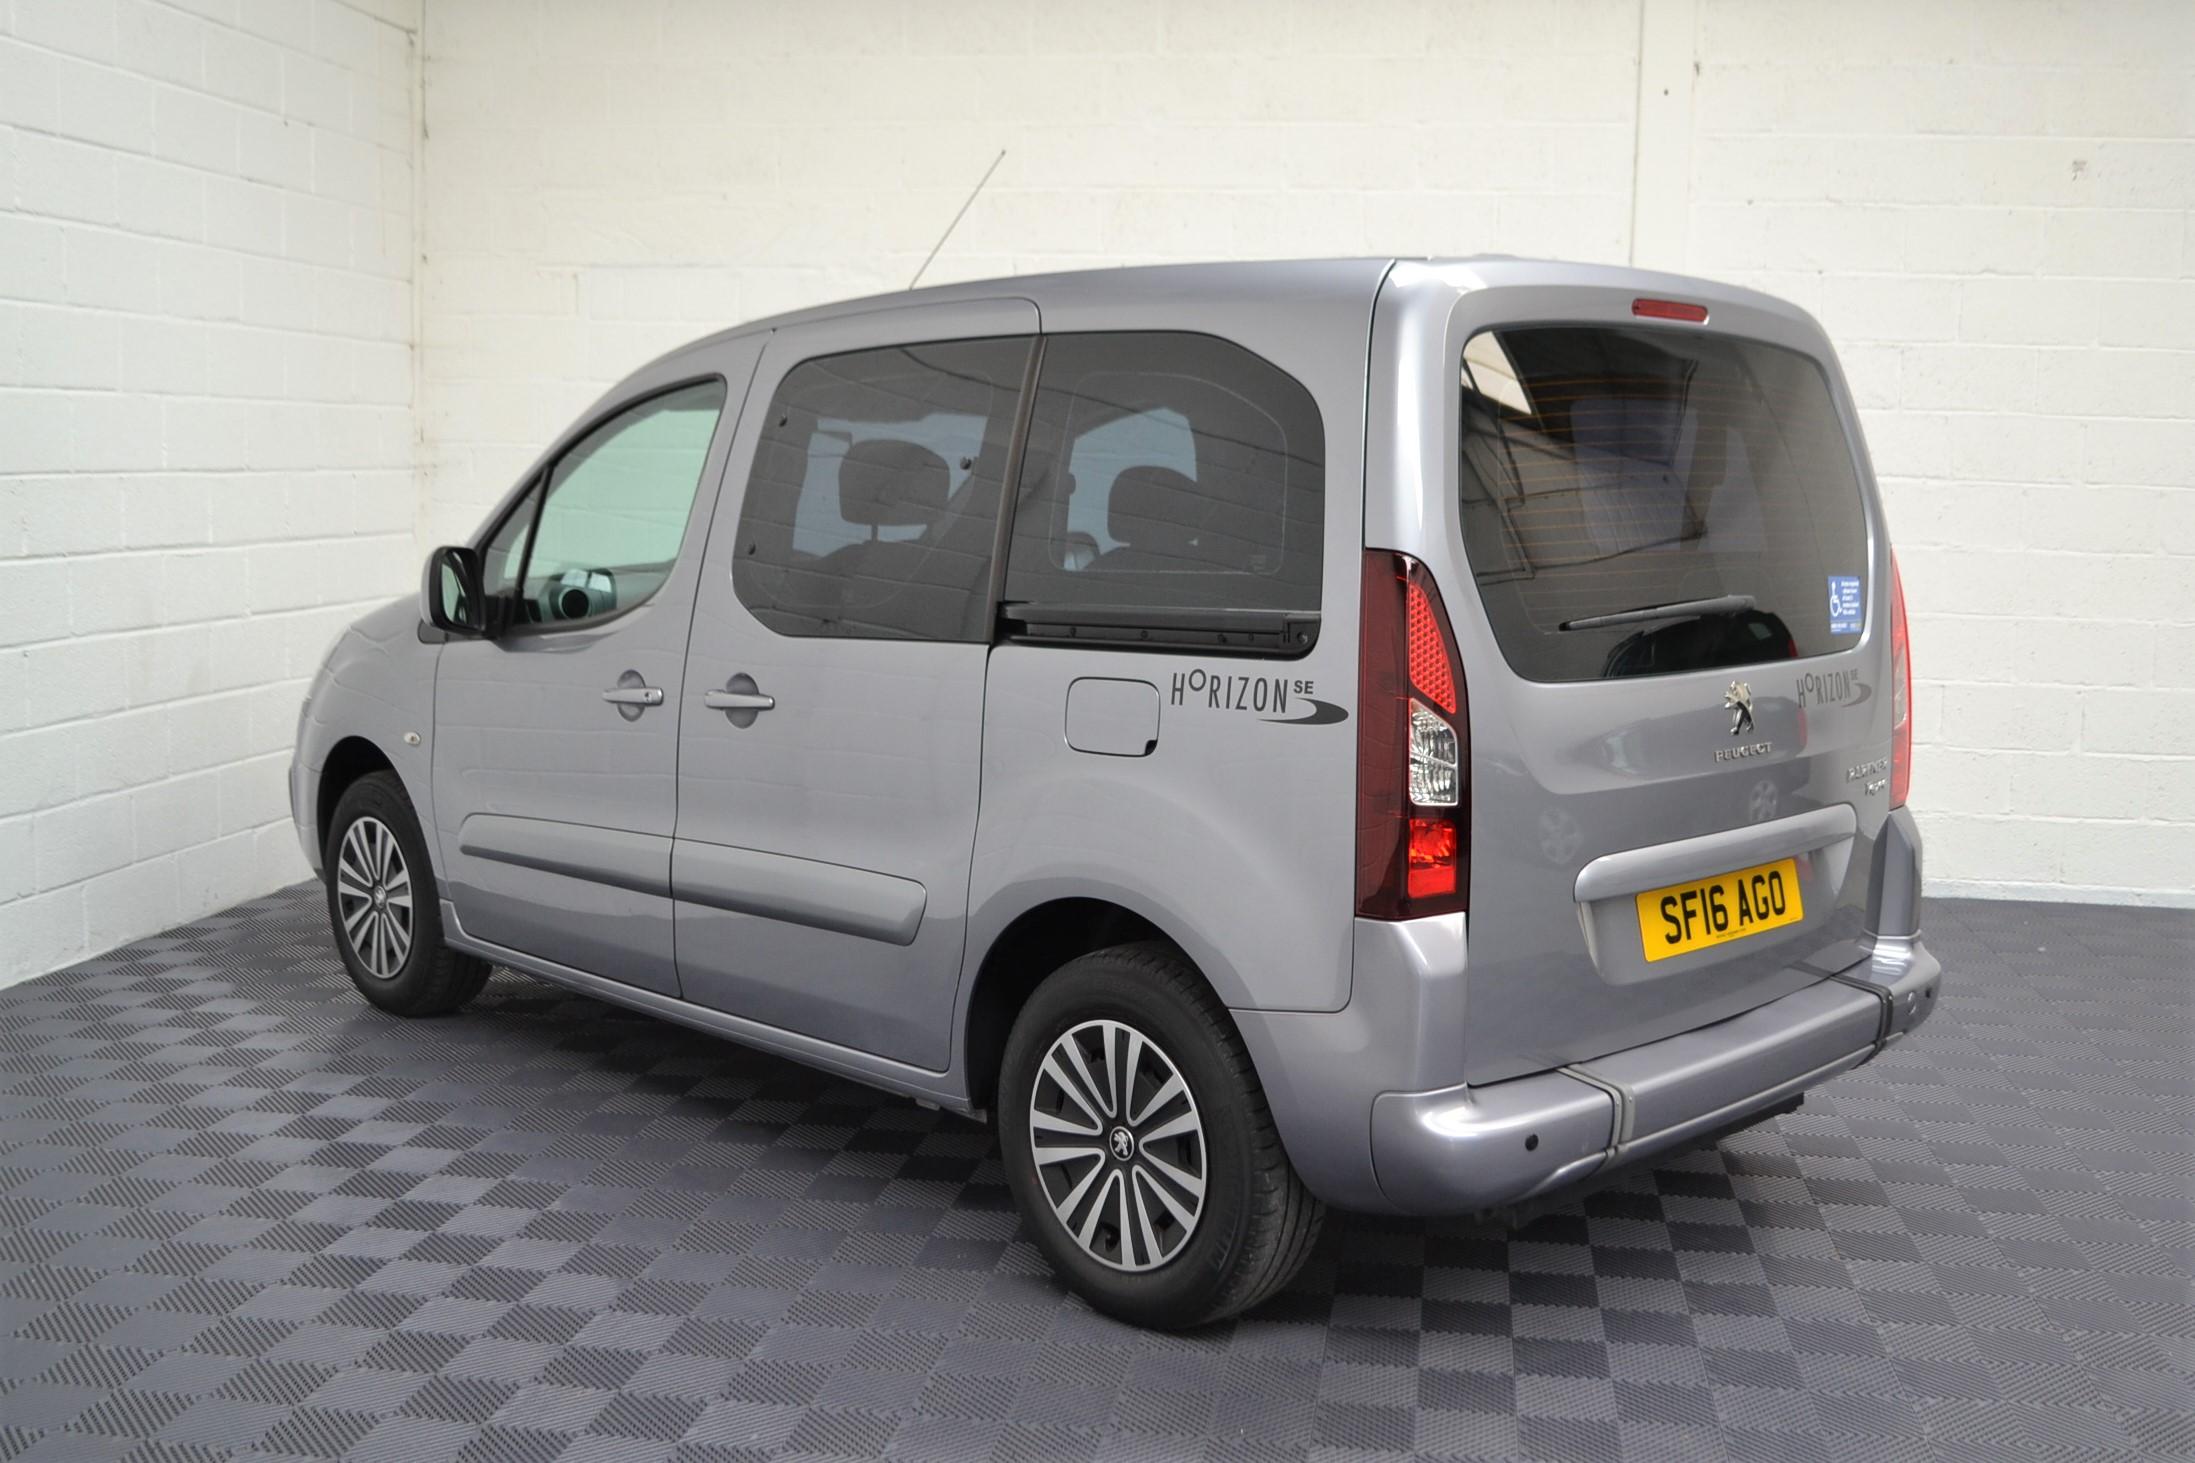 Used Wav Cars for Sale UK Citroen Berlingo WAV Car Peugeot Partner Petrol Wheelchair Accessible Vehicles Buy Sell Bristol Somerset Devon Dorset 21